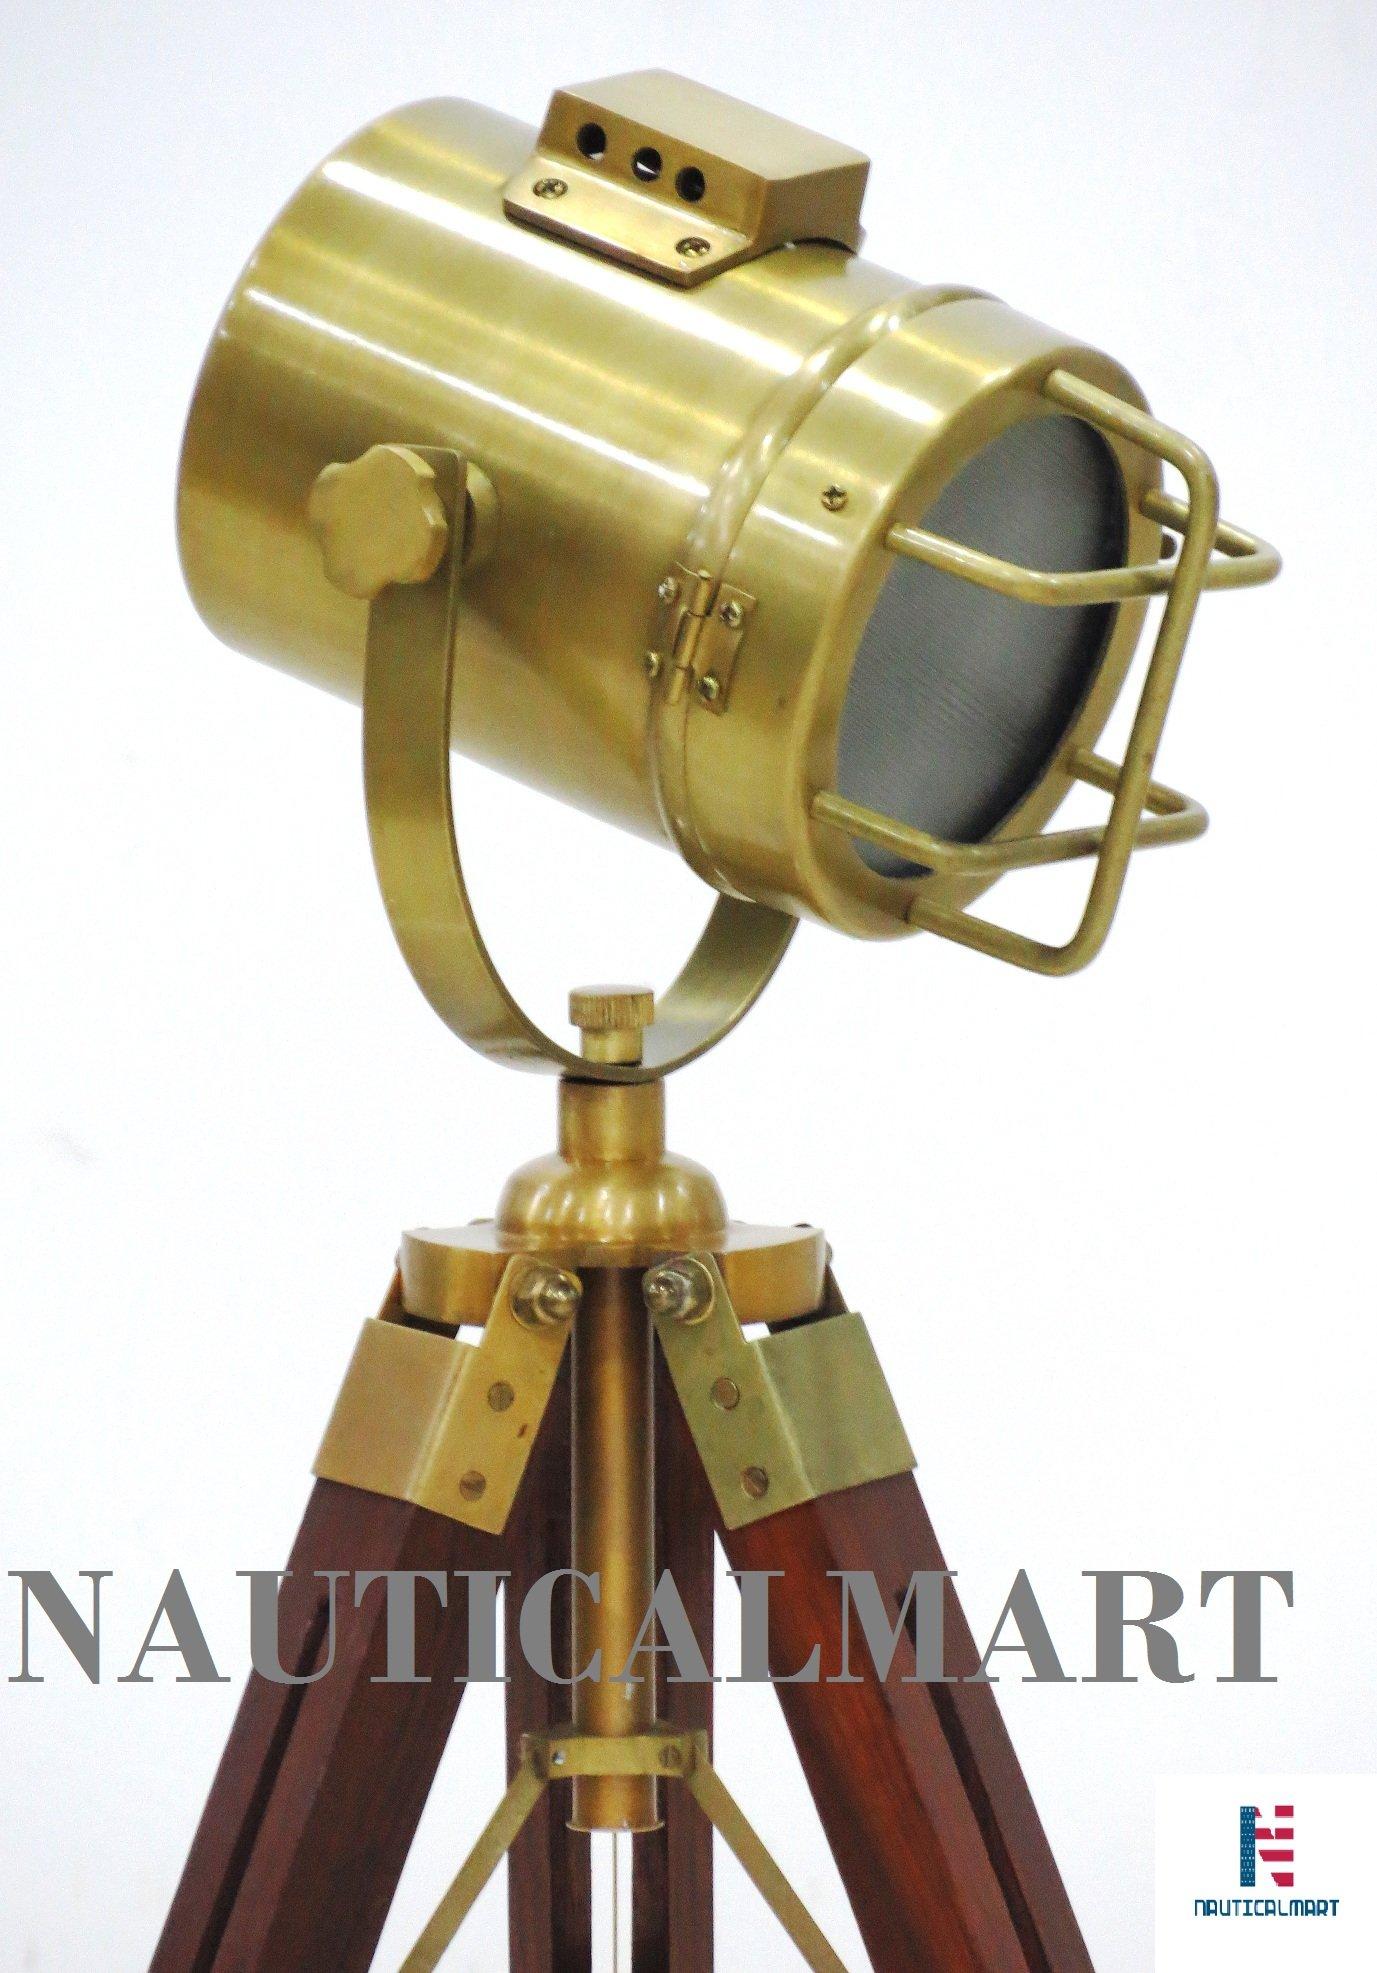 NauticalMart Antique Brass Nautical Searchlight Wooden Tripod Stand